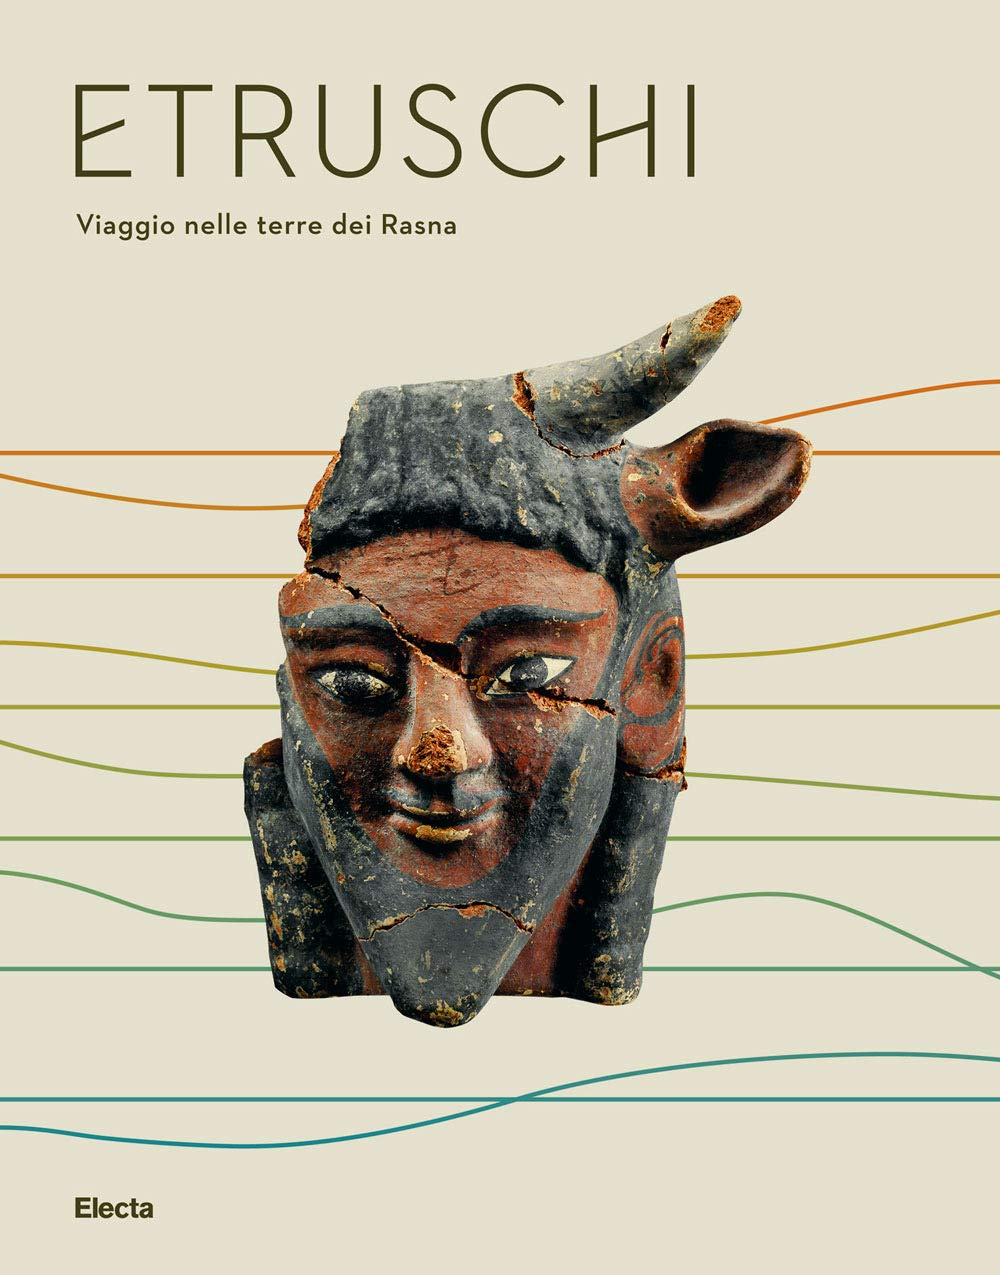 bologna_Archeologico_Catalogo-electa_mostra-Etruschi_foto-electa